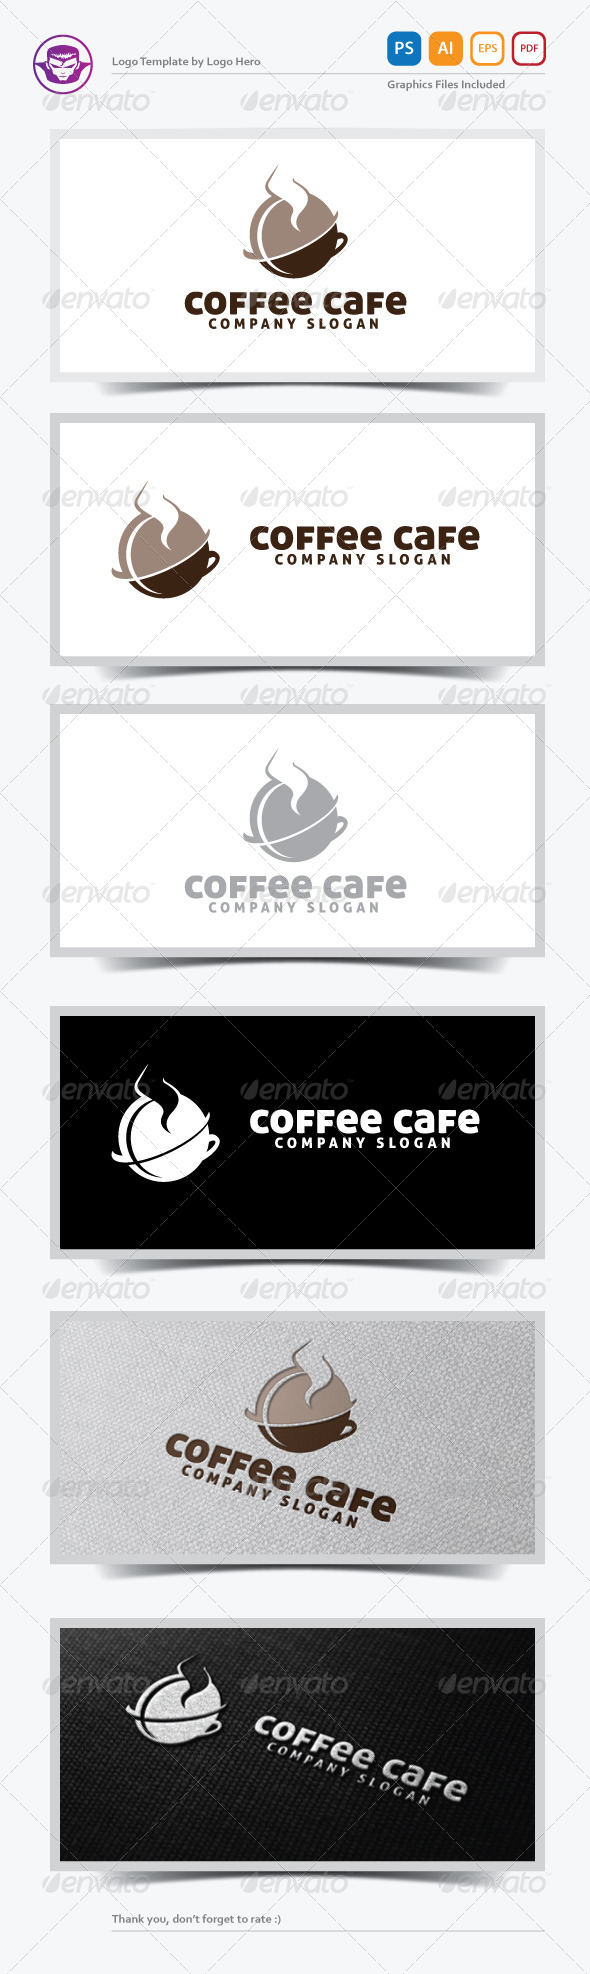 GraphicRiver Coffee Cafe Logo Template 5330140